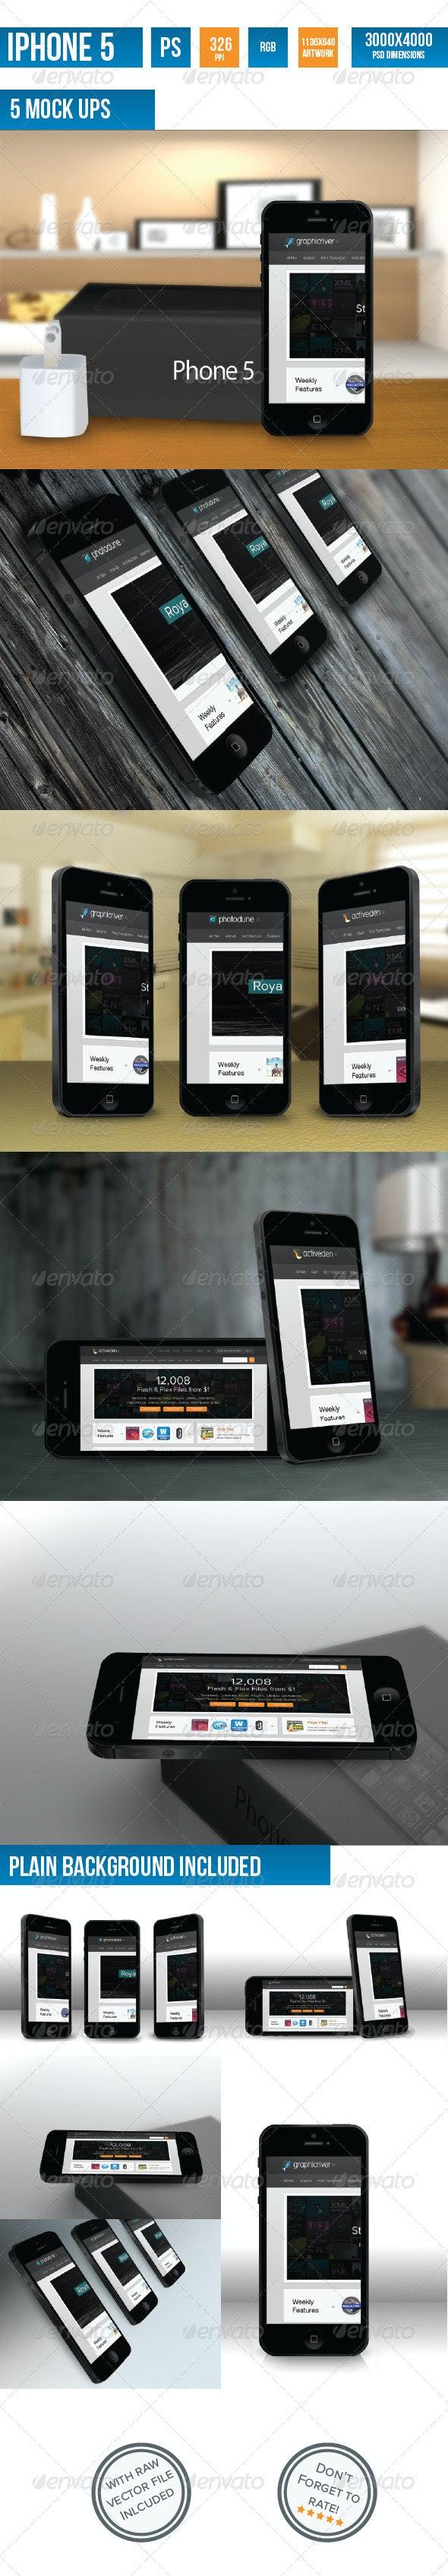 iPhone 5 Photorealistic Mock-UP - Mobile Displays